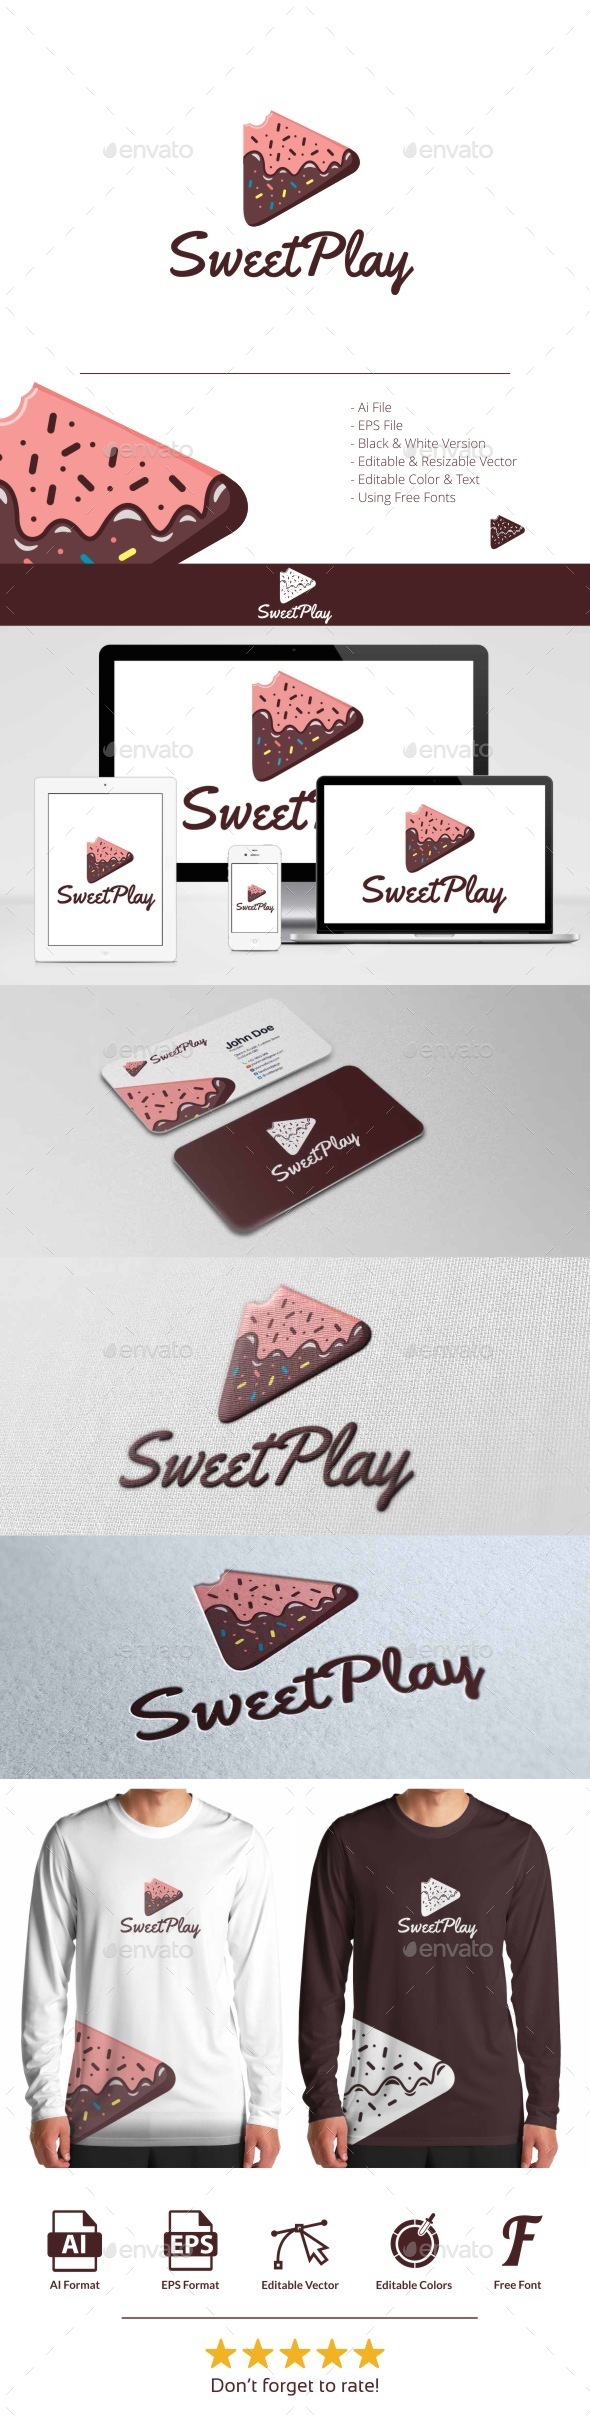 Sweet Play Logo